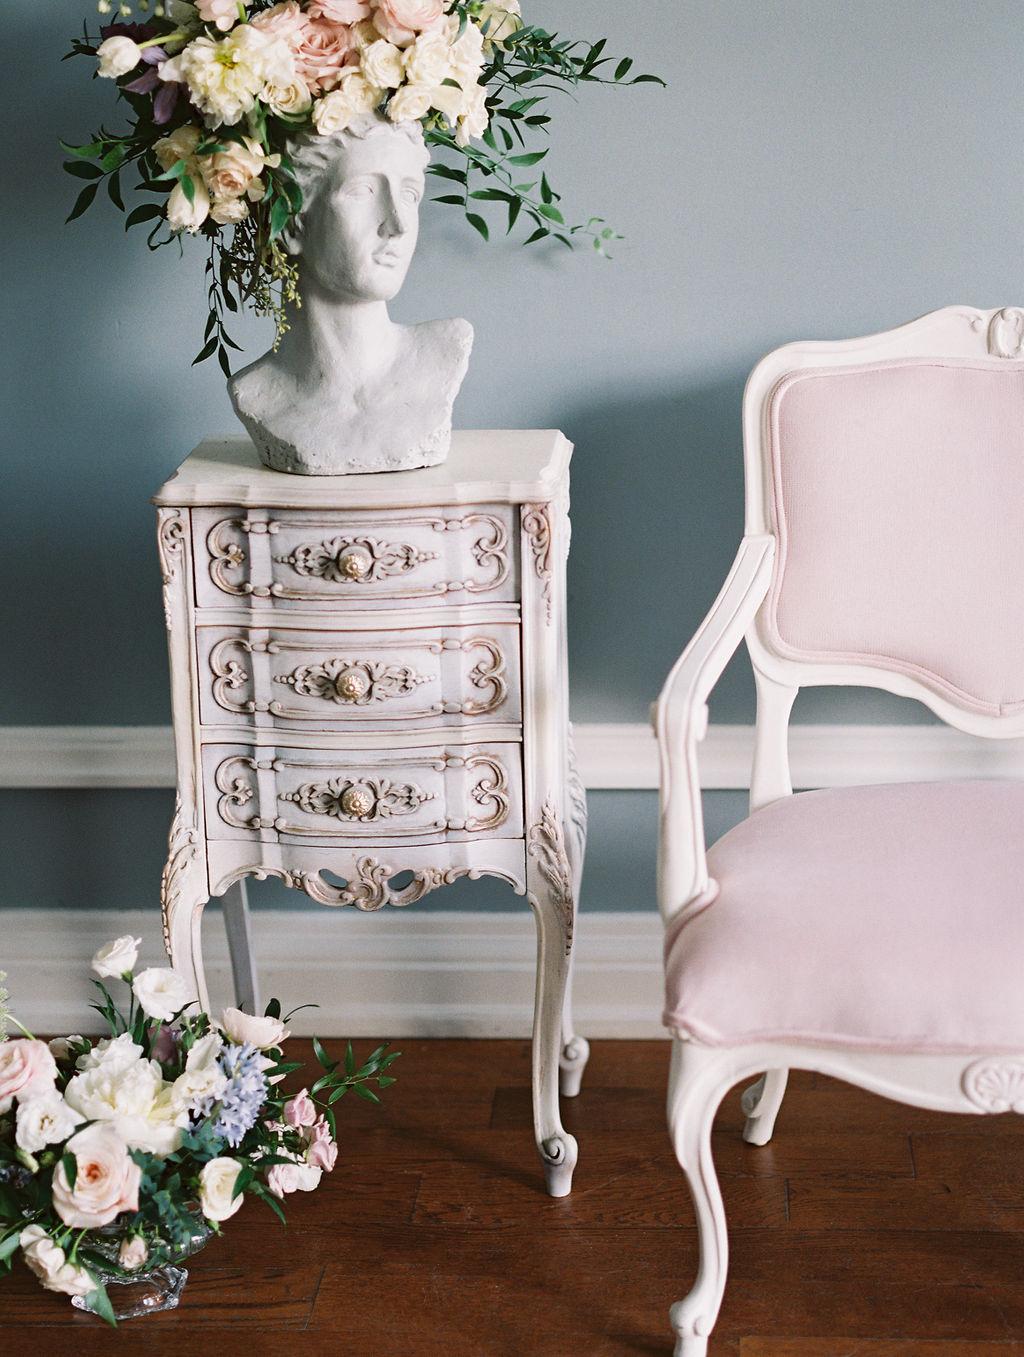 Romantic-French-Garden-WhitneyHeardPhotography-6011129-R1-E005